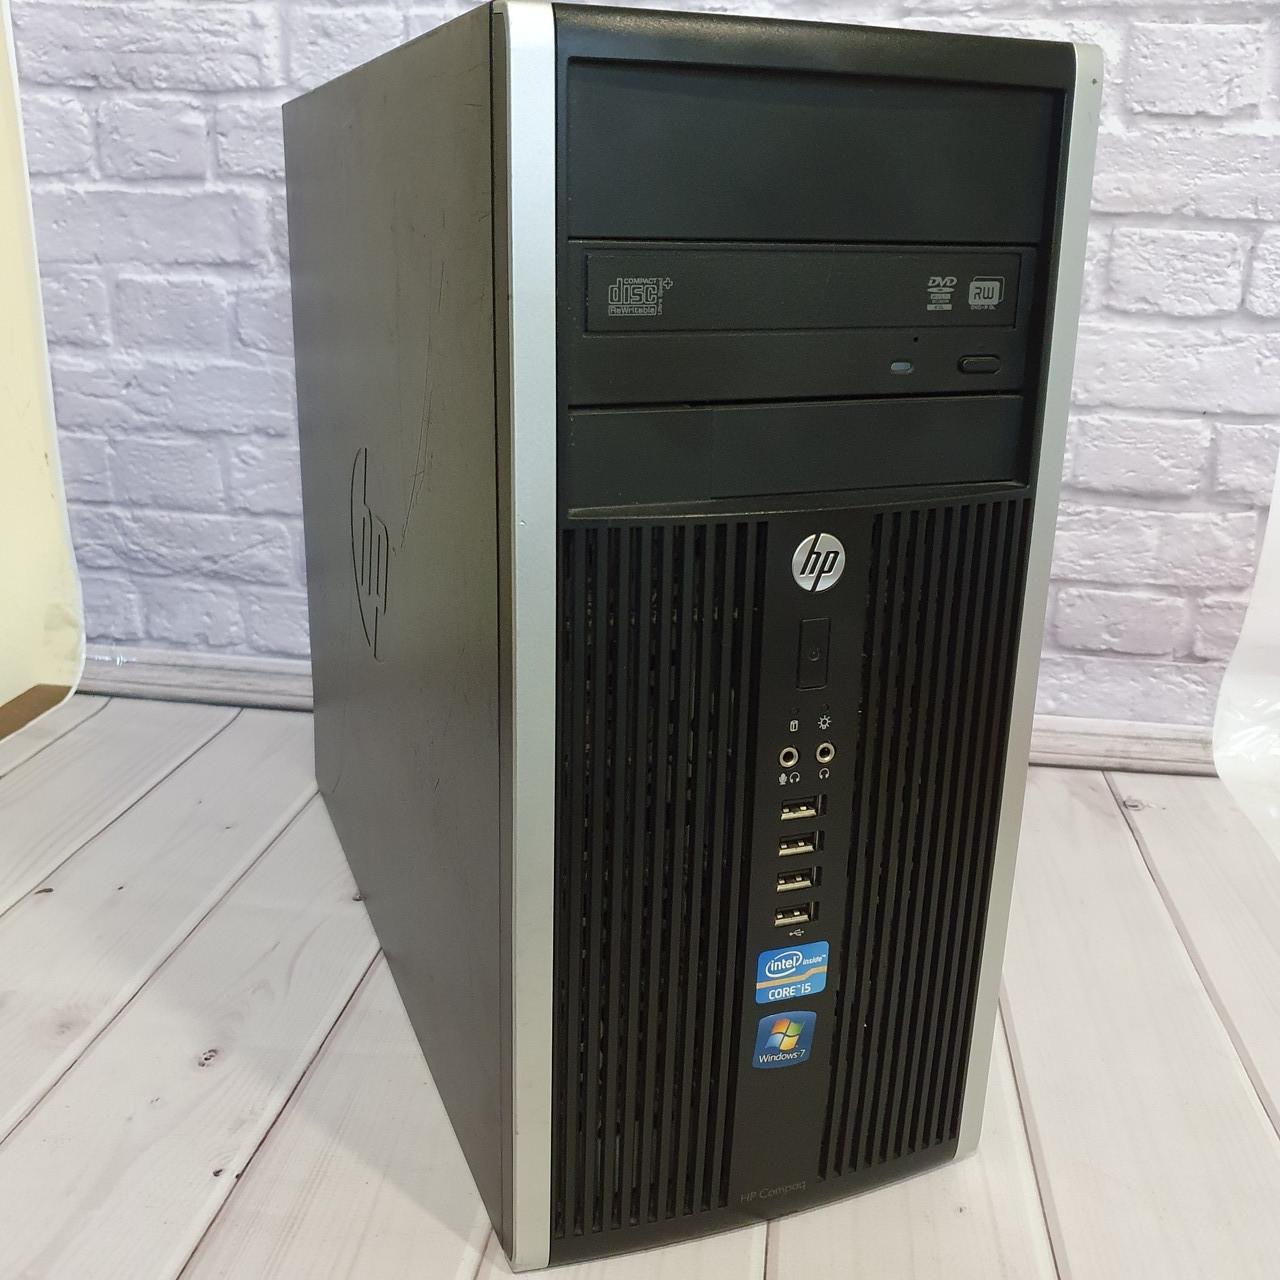 Системный блок Terra MT (Intel Core i5-3470 4x3.60Ghz/4Gb DDR3/HDD 500Gb/DVD)